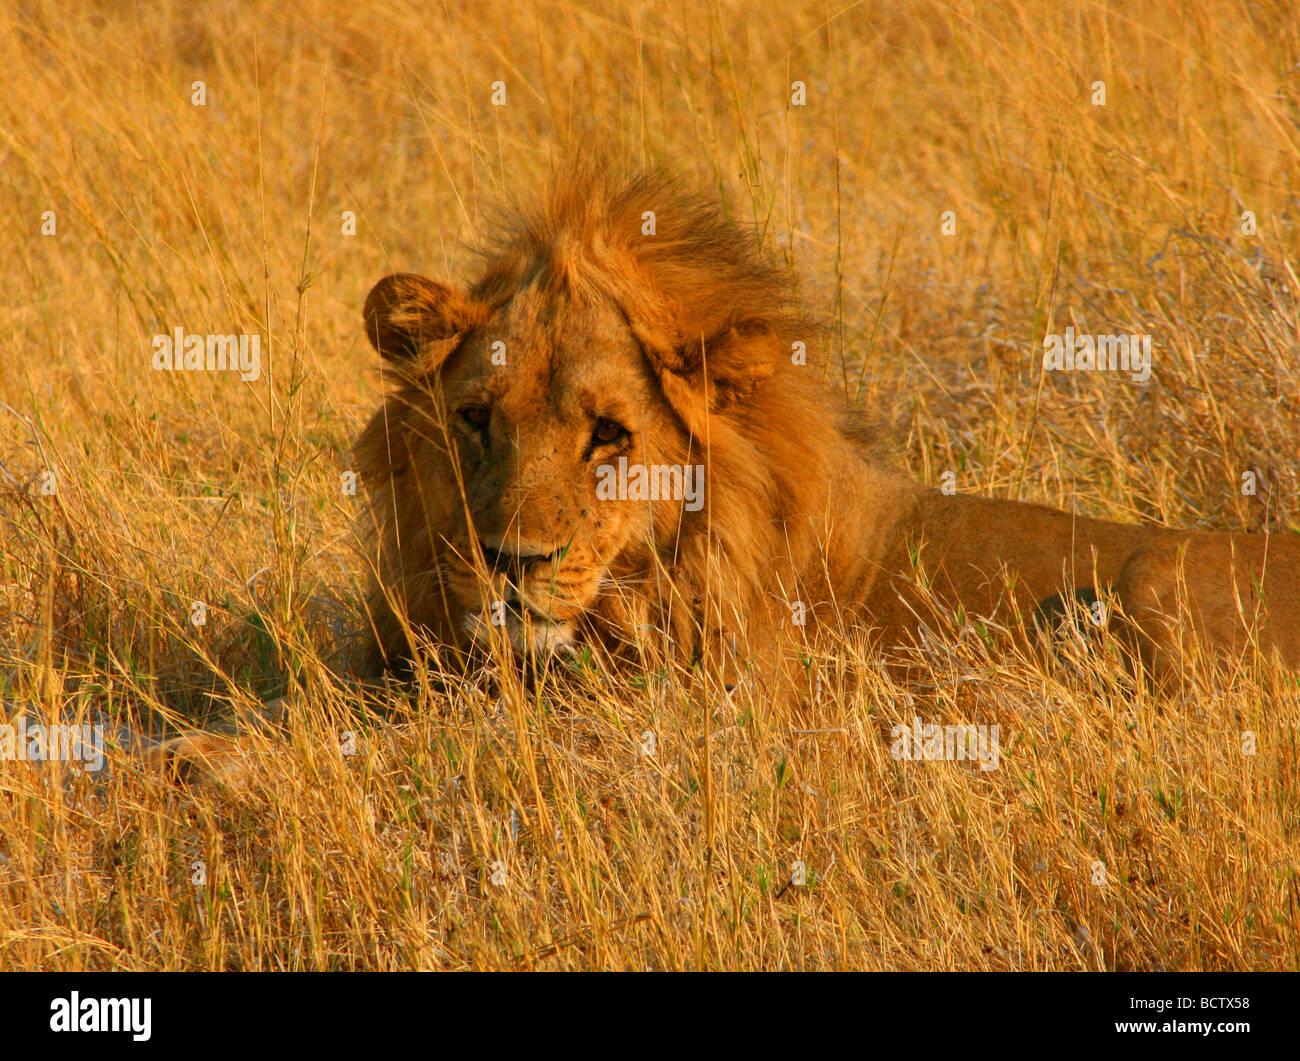 Lion (Panthera leo) lying in the tall grass, Okavango Delta, Botswana - Stock Image